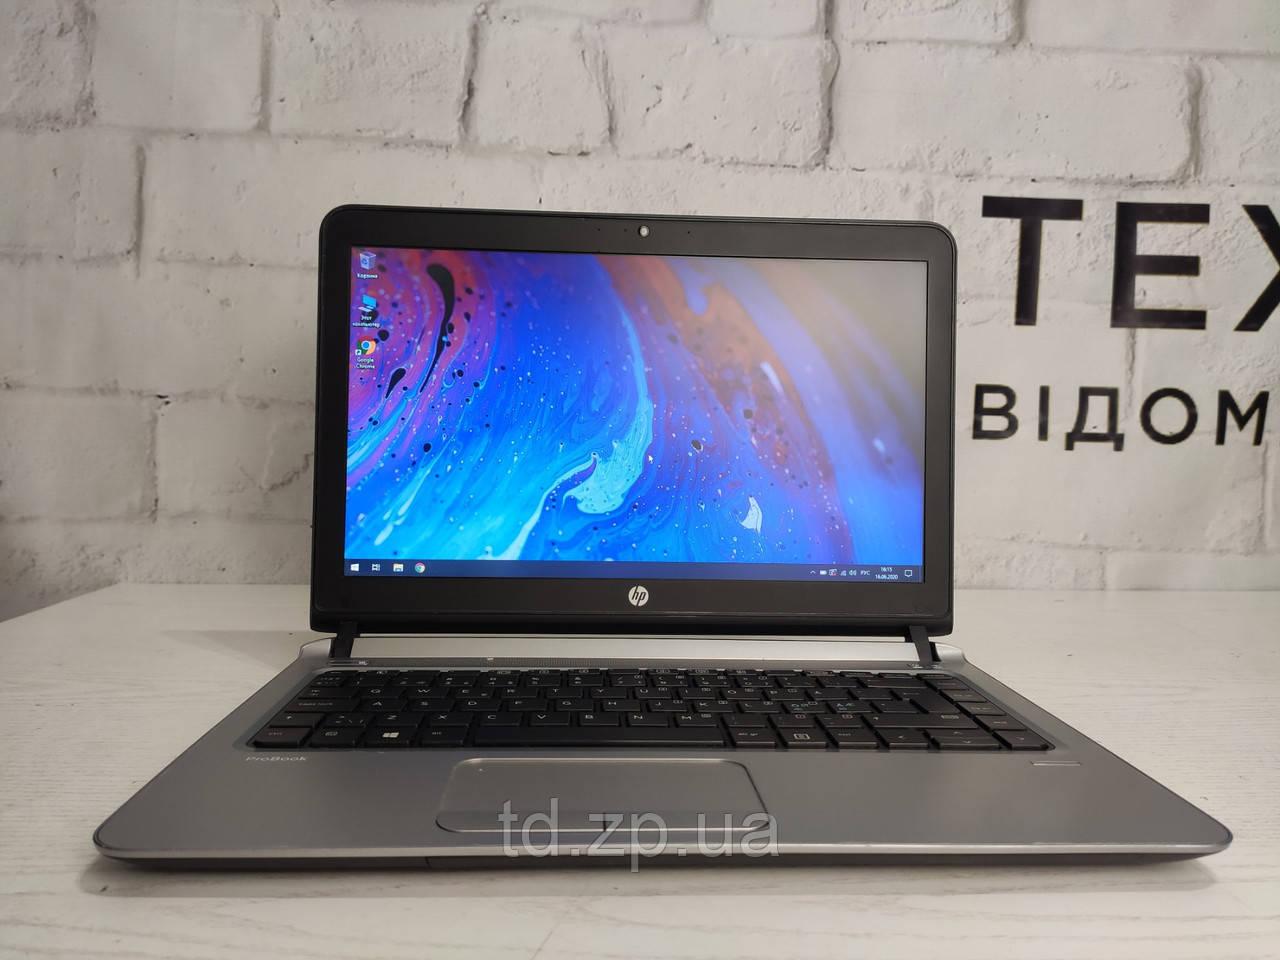 Ноутбук HP Probook 430 13,1' Intel Pentium 4405u / 4Gb DDR 4 /  120Gb SSD / Intel HD Graphics 510